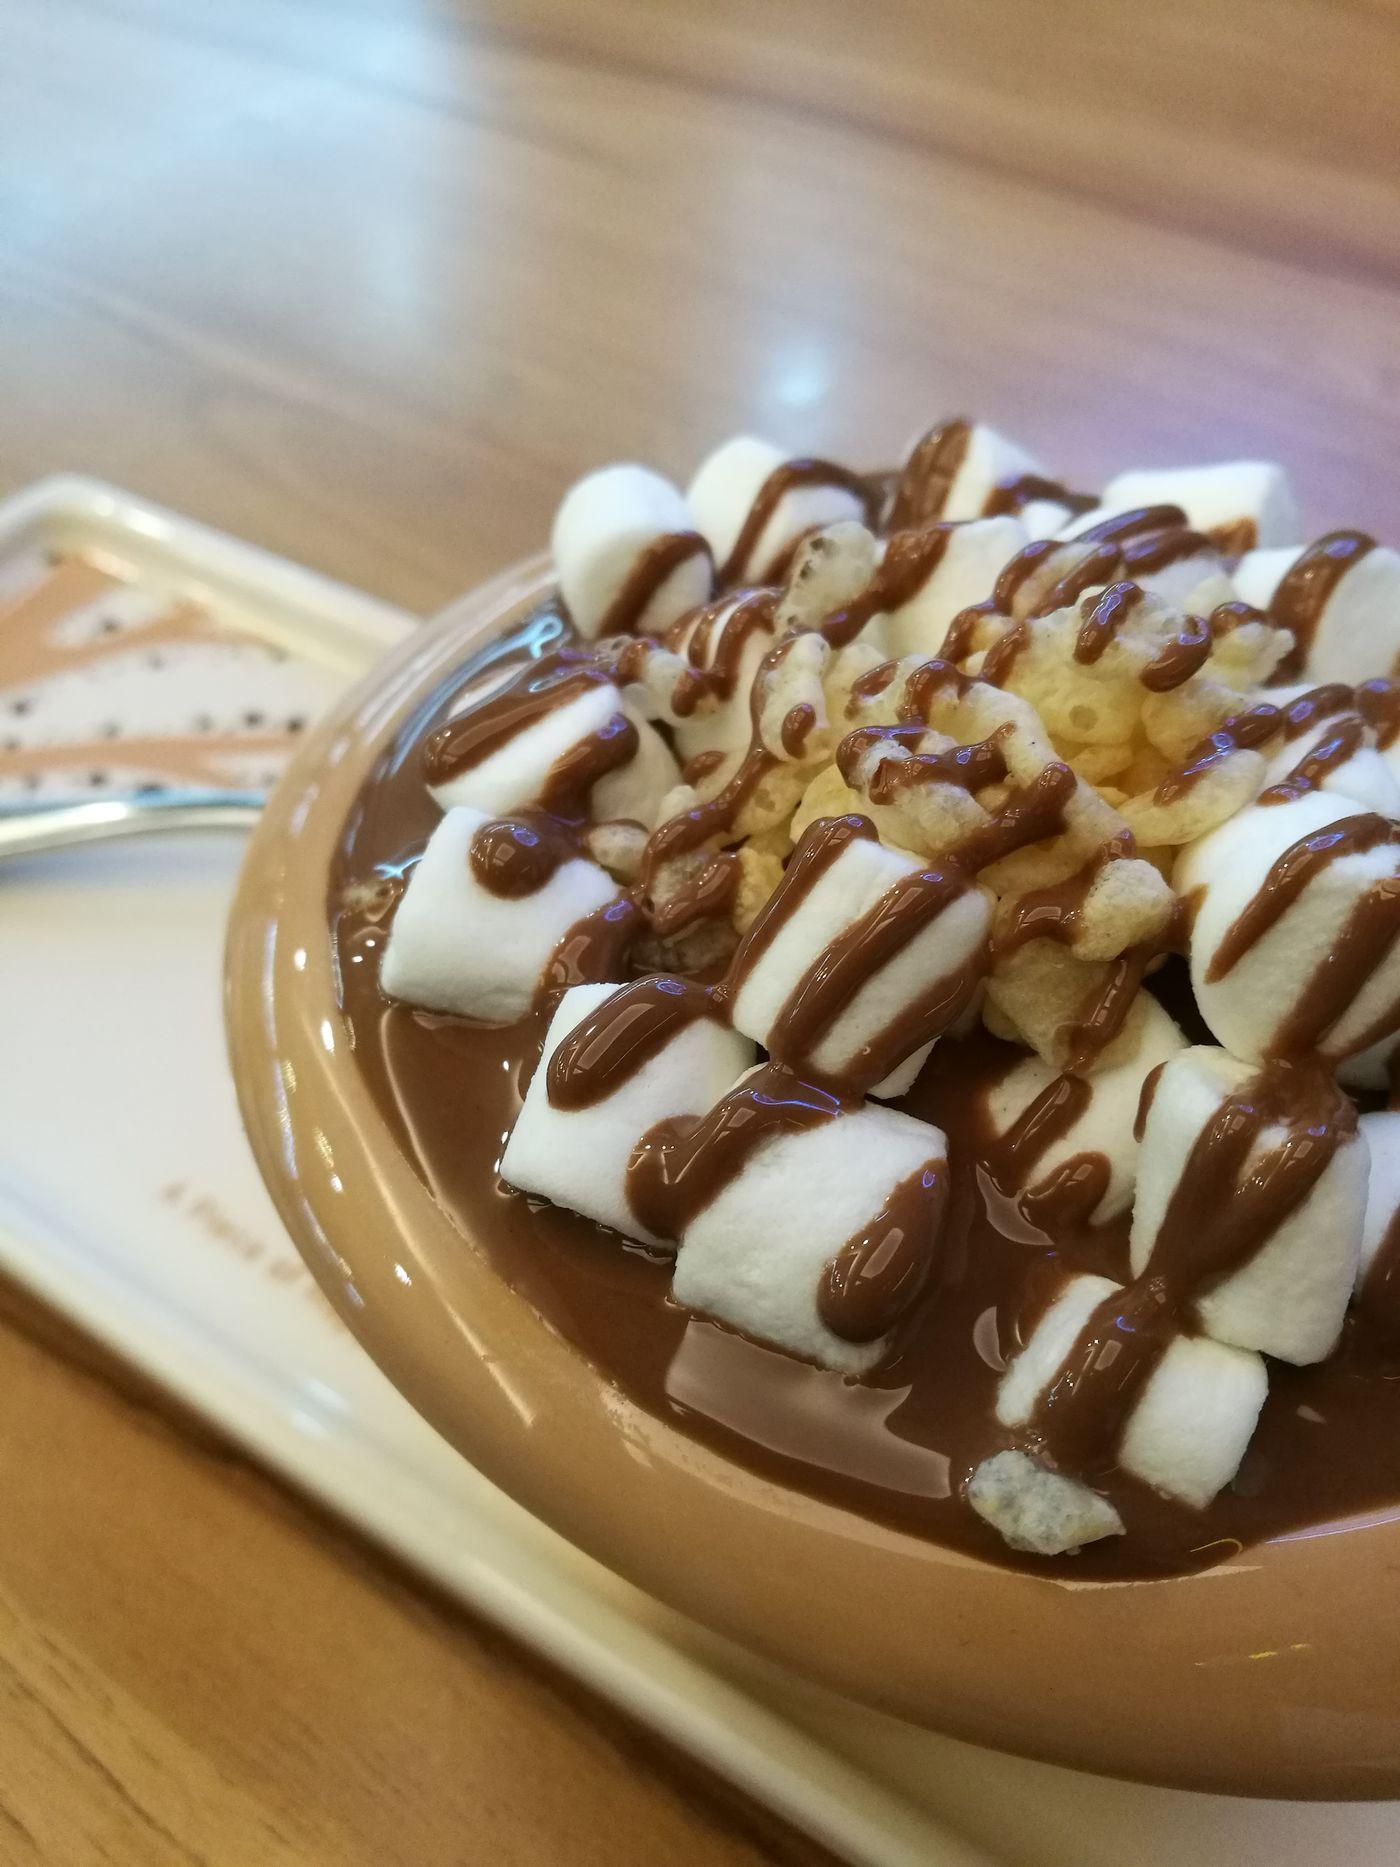 🍫 Chocolate Time Chocolate Crispy Rice Food Hunting Malacca Historical City, Malaysia Molten Chocolate Food EyeEmNewHere